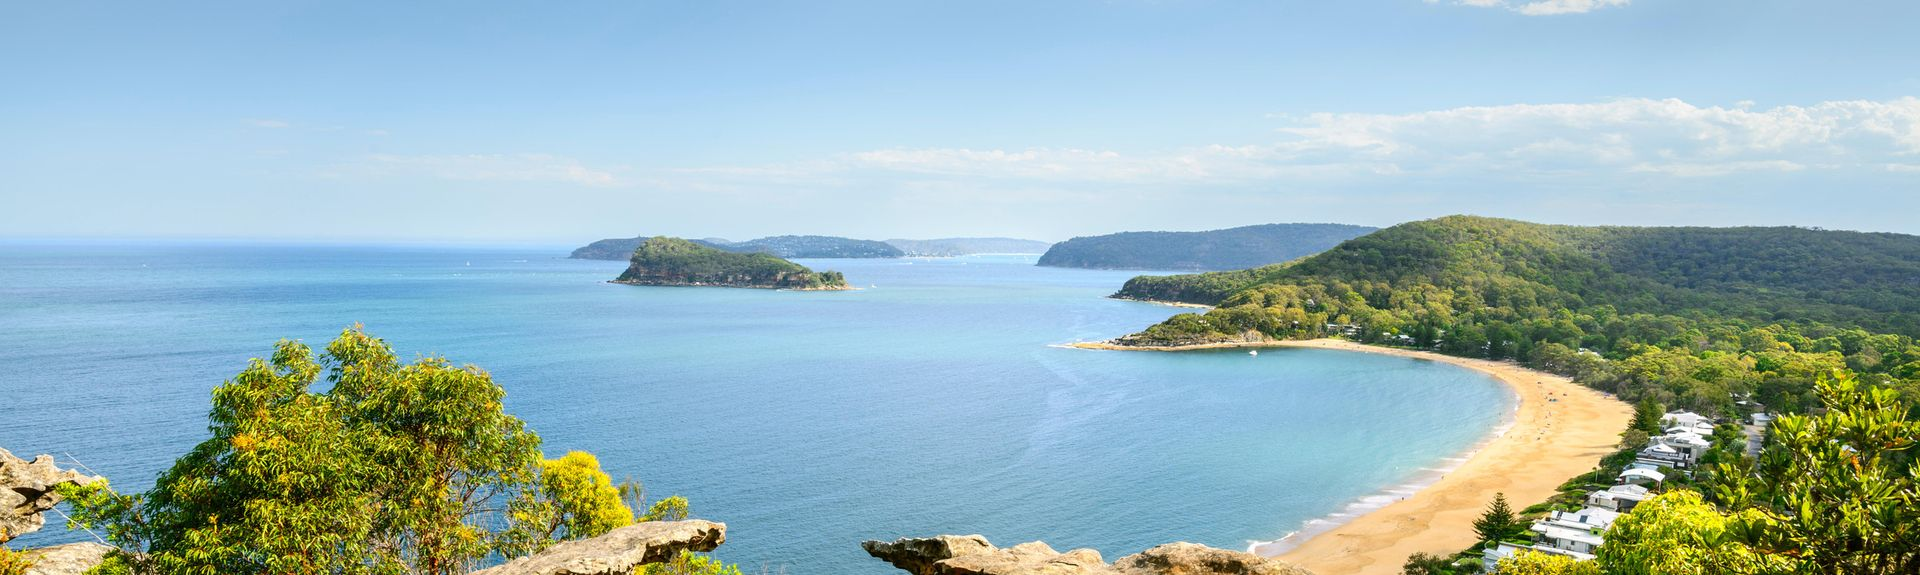 Pearl Beach NSW, Australia